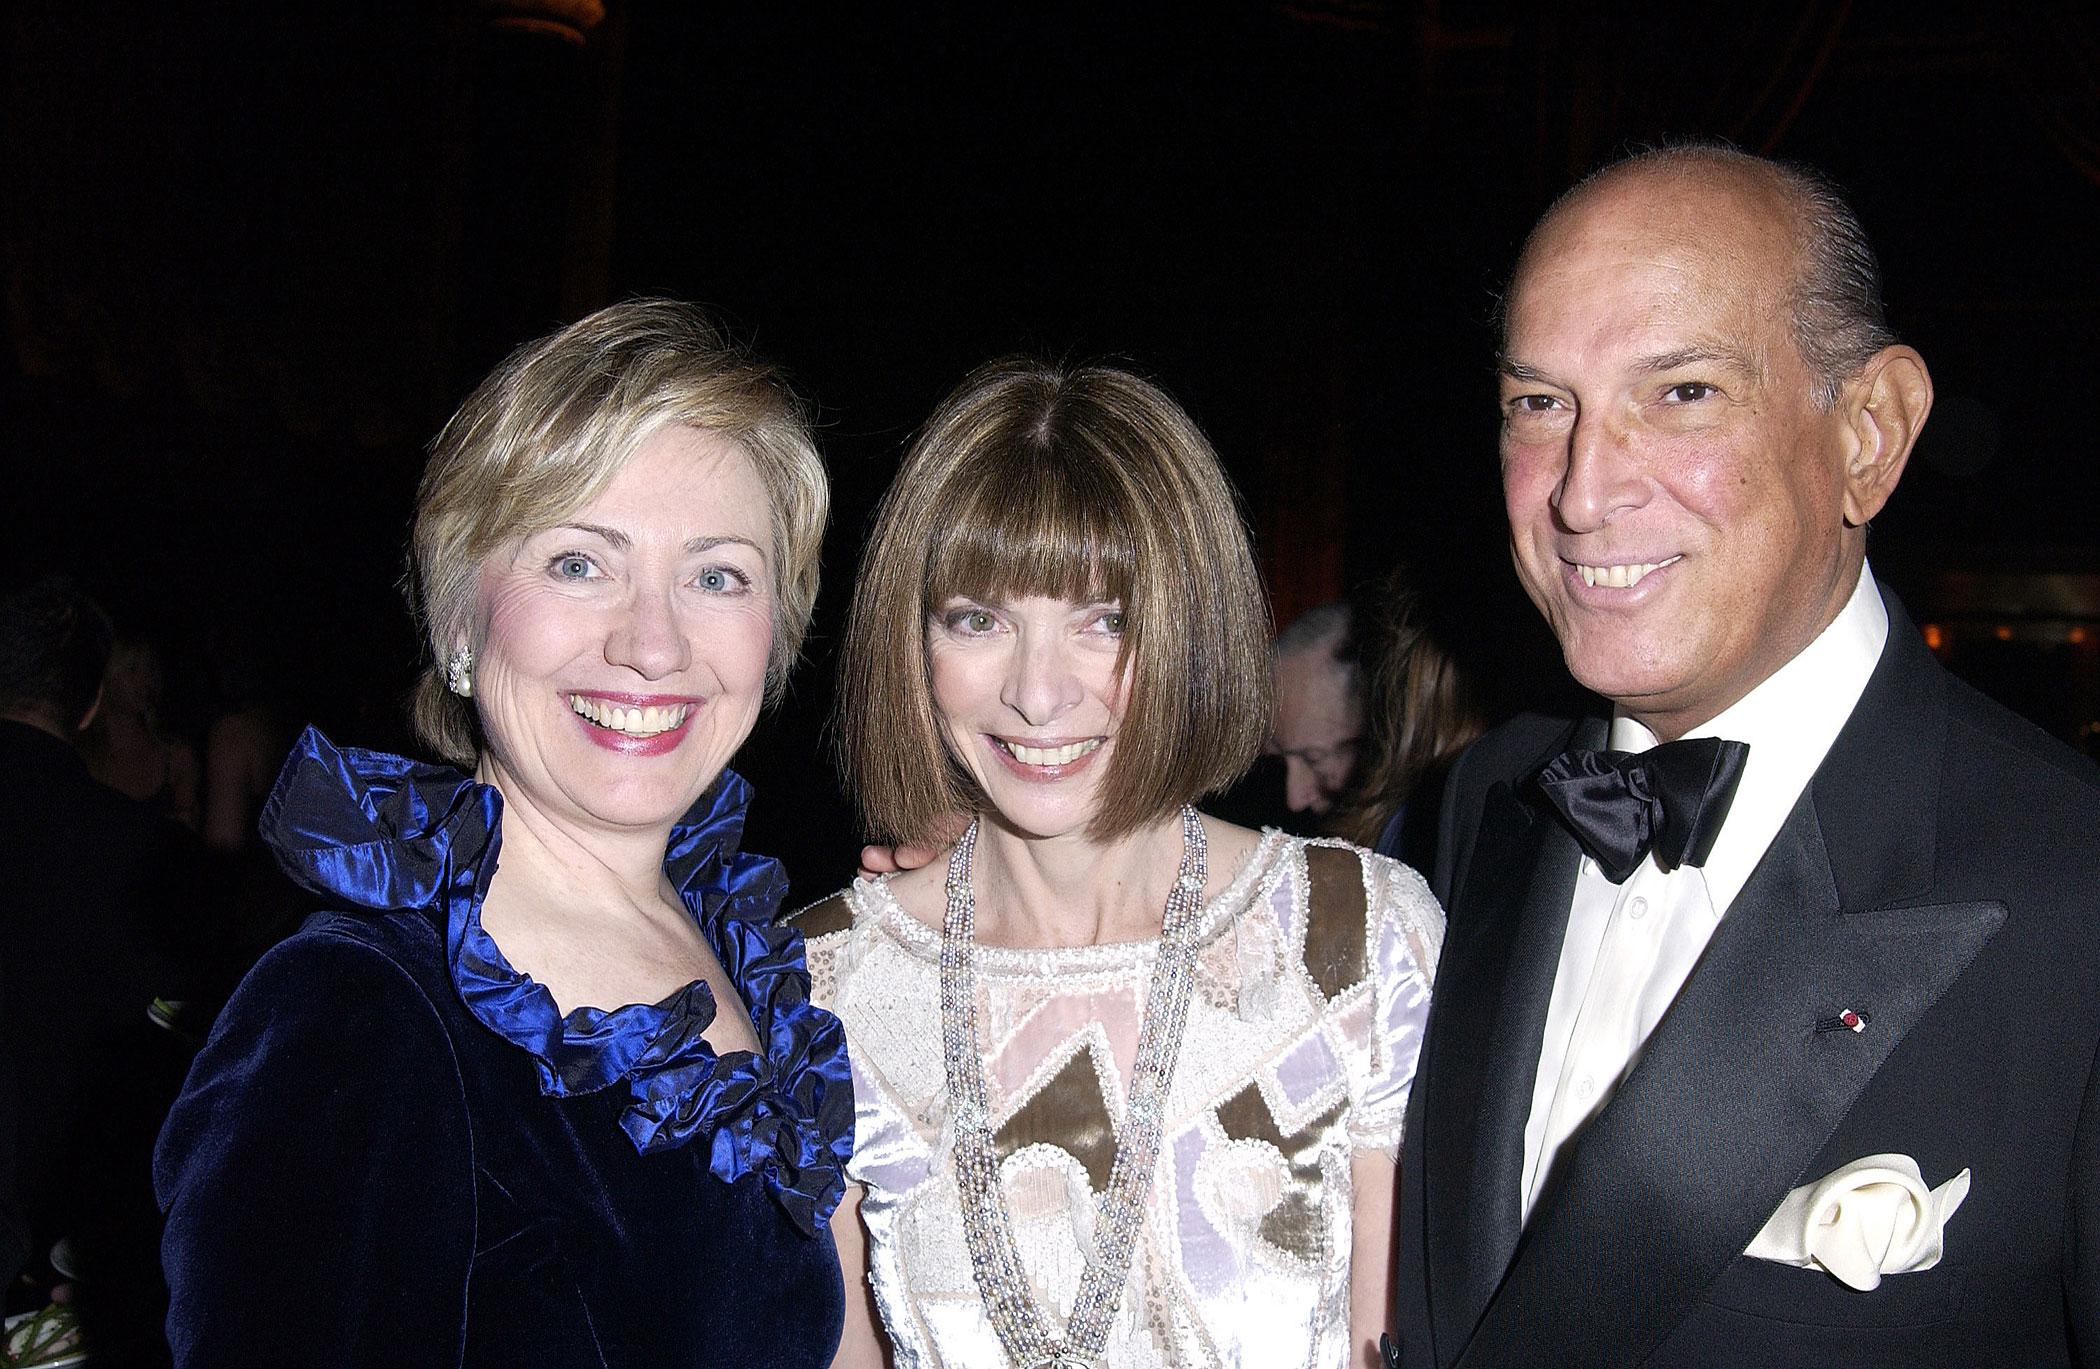 Hillary Clinton, Anna Wintour and Oscar de la Renta attend AmfAR in 2003.